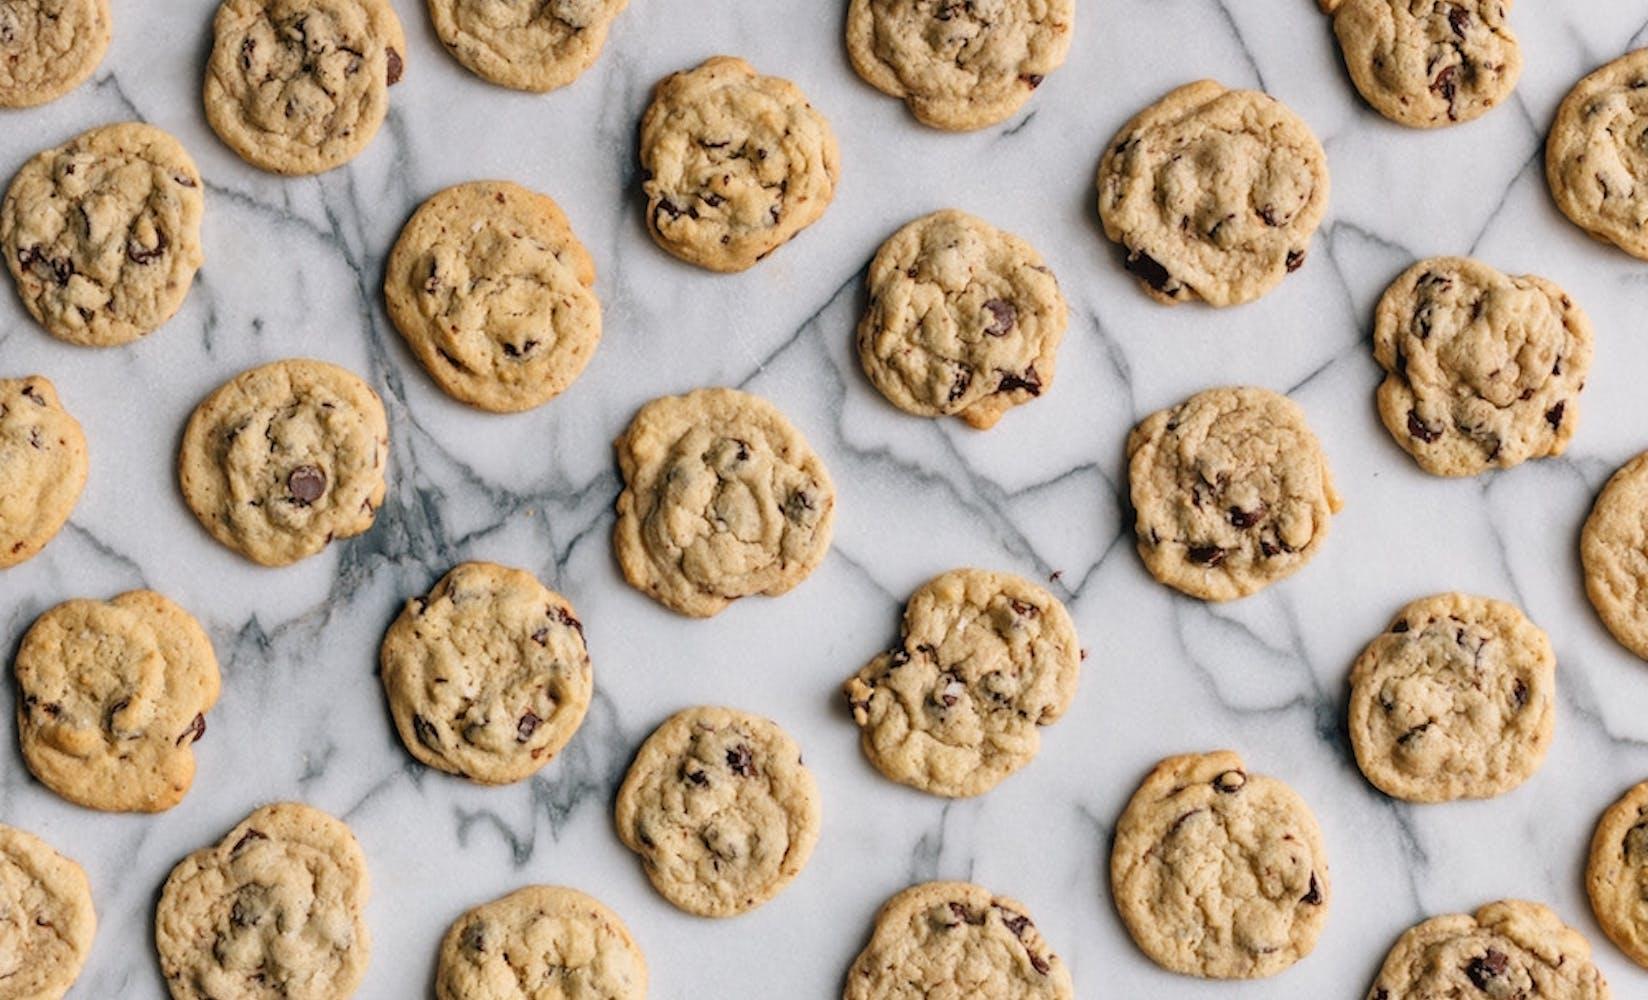 Flipgive baking fundraiser 100 fundraising ideas